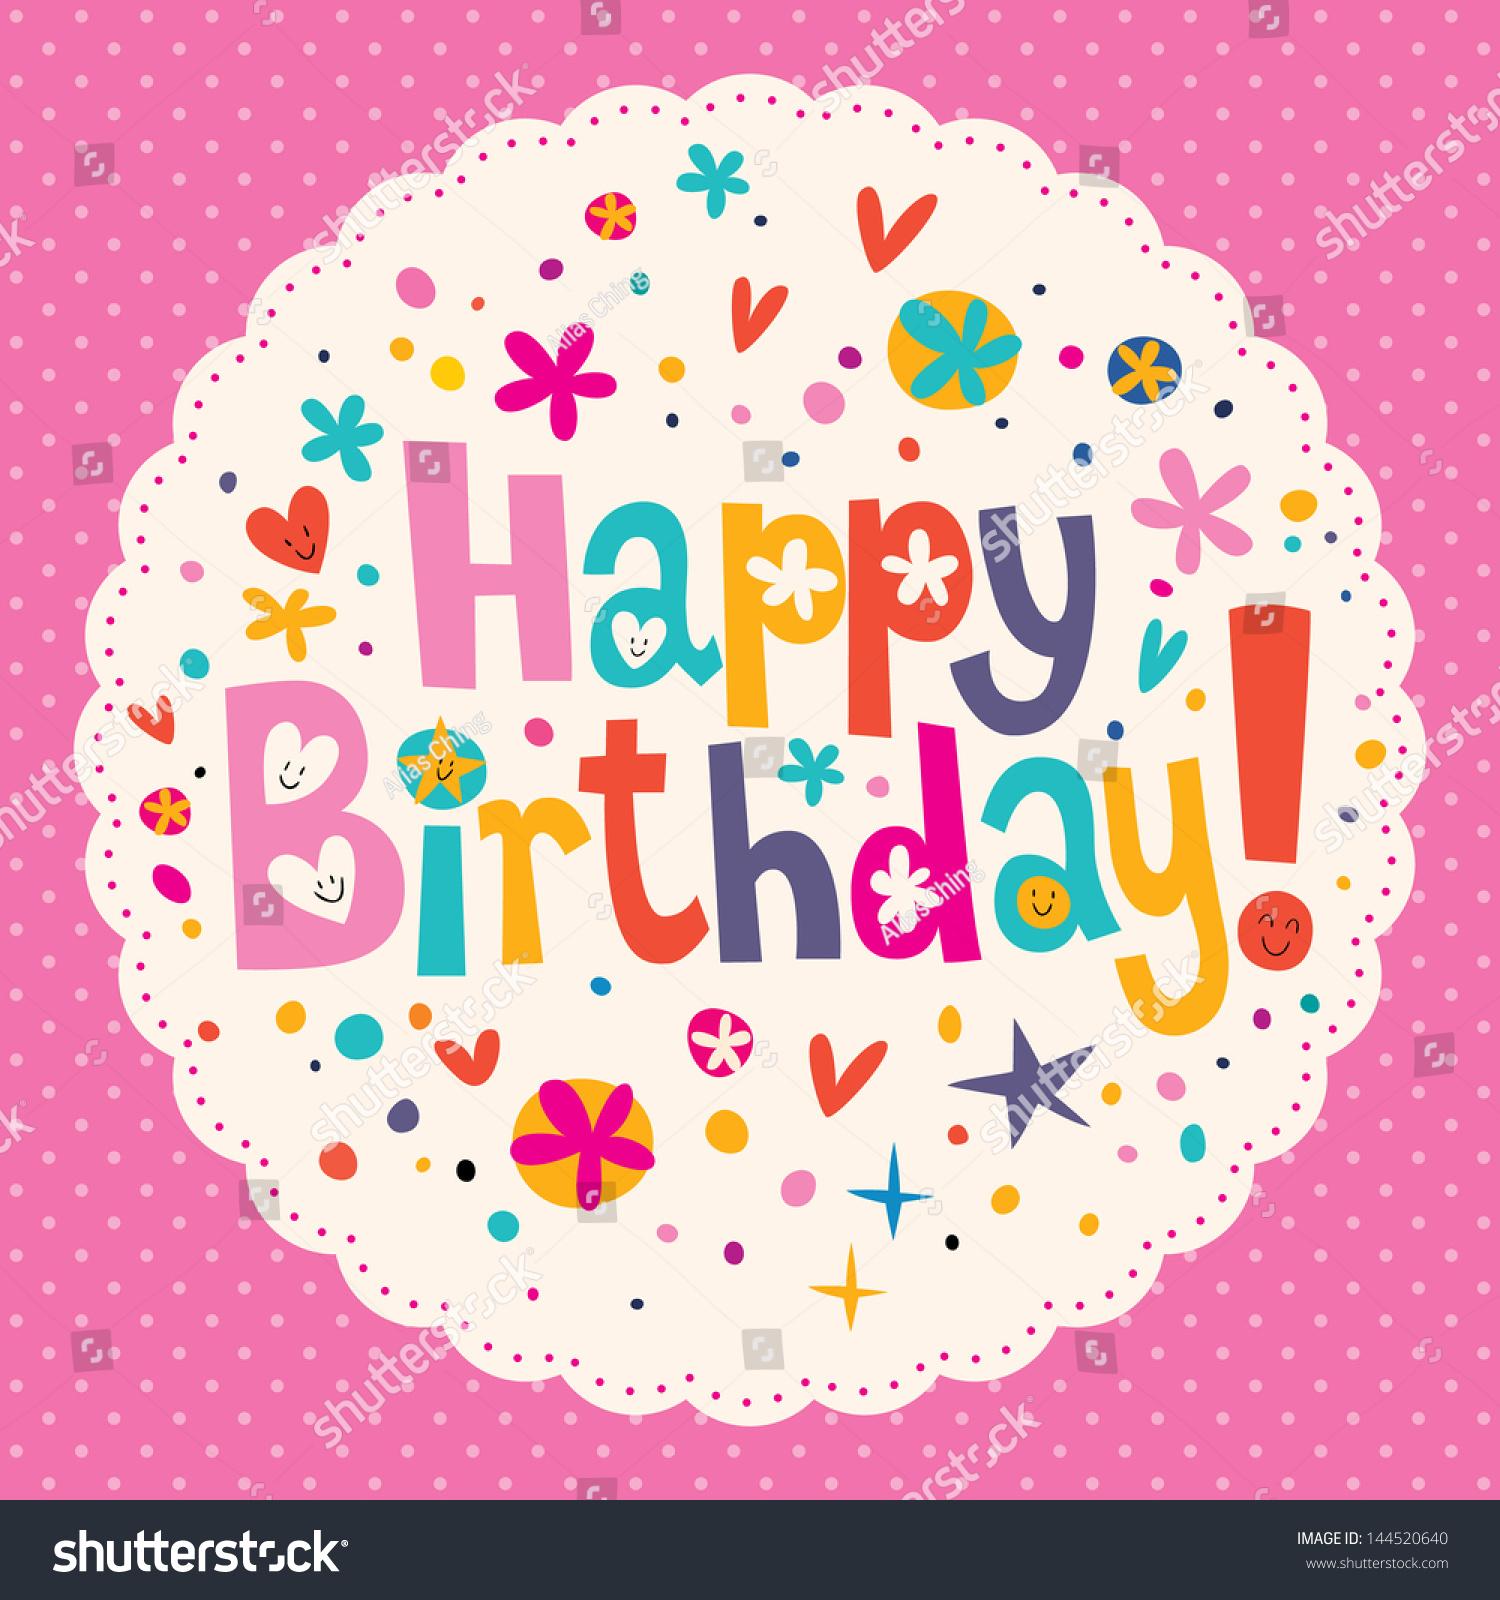 Happy Birthday Stock Vector 144520640 - Shutterstock